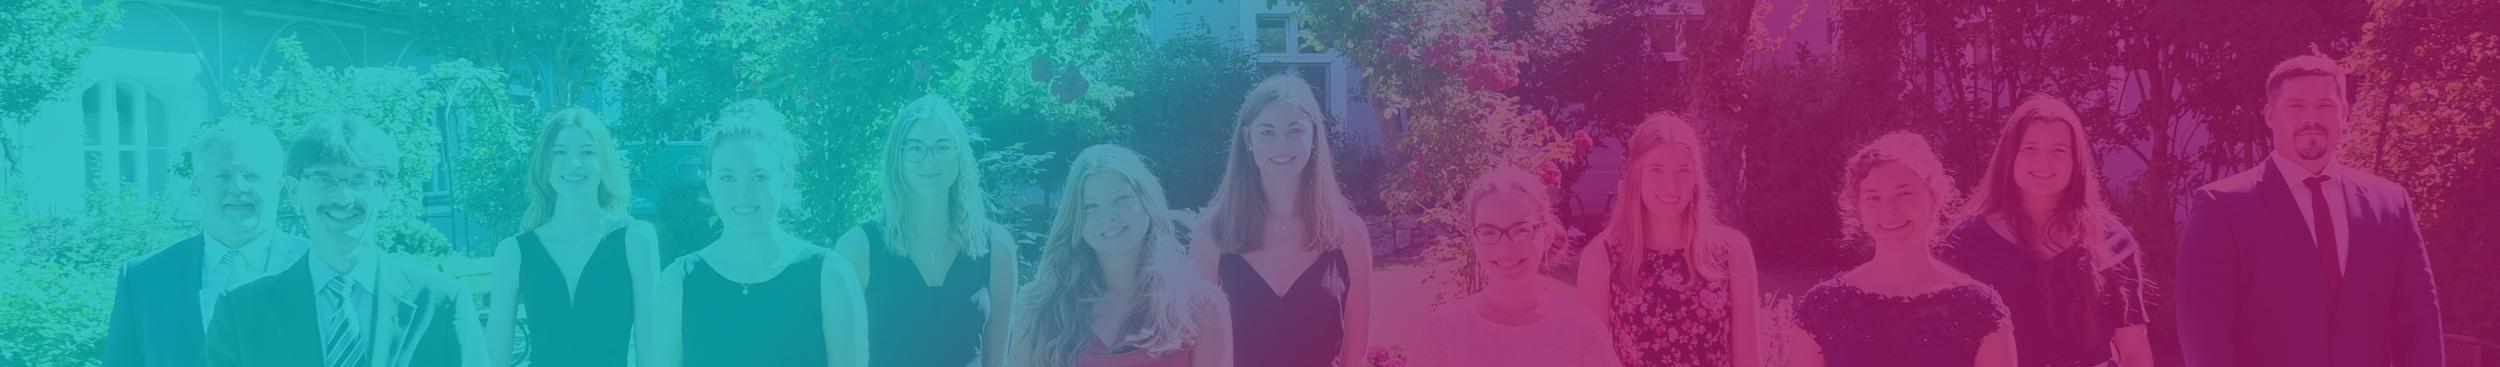 DJDG-Abiturfeier 2021: Segel setzen